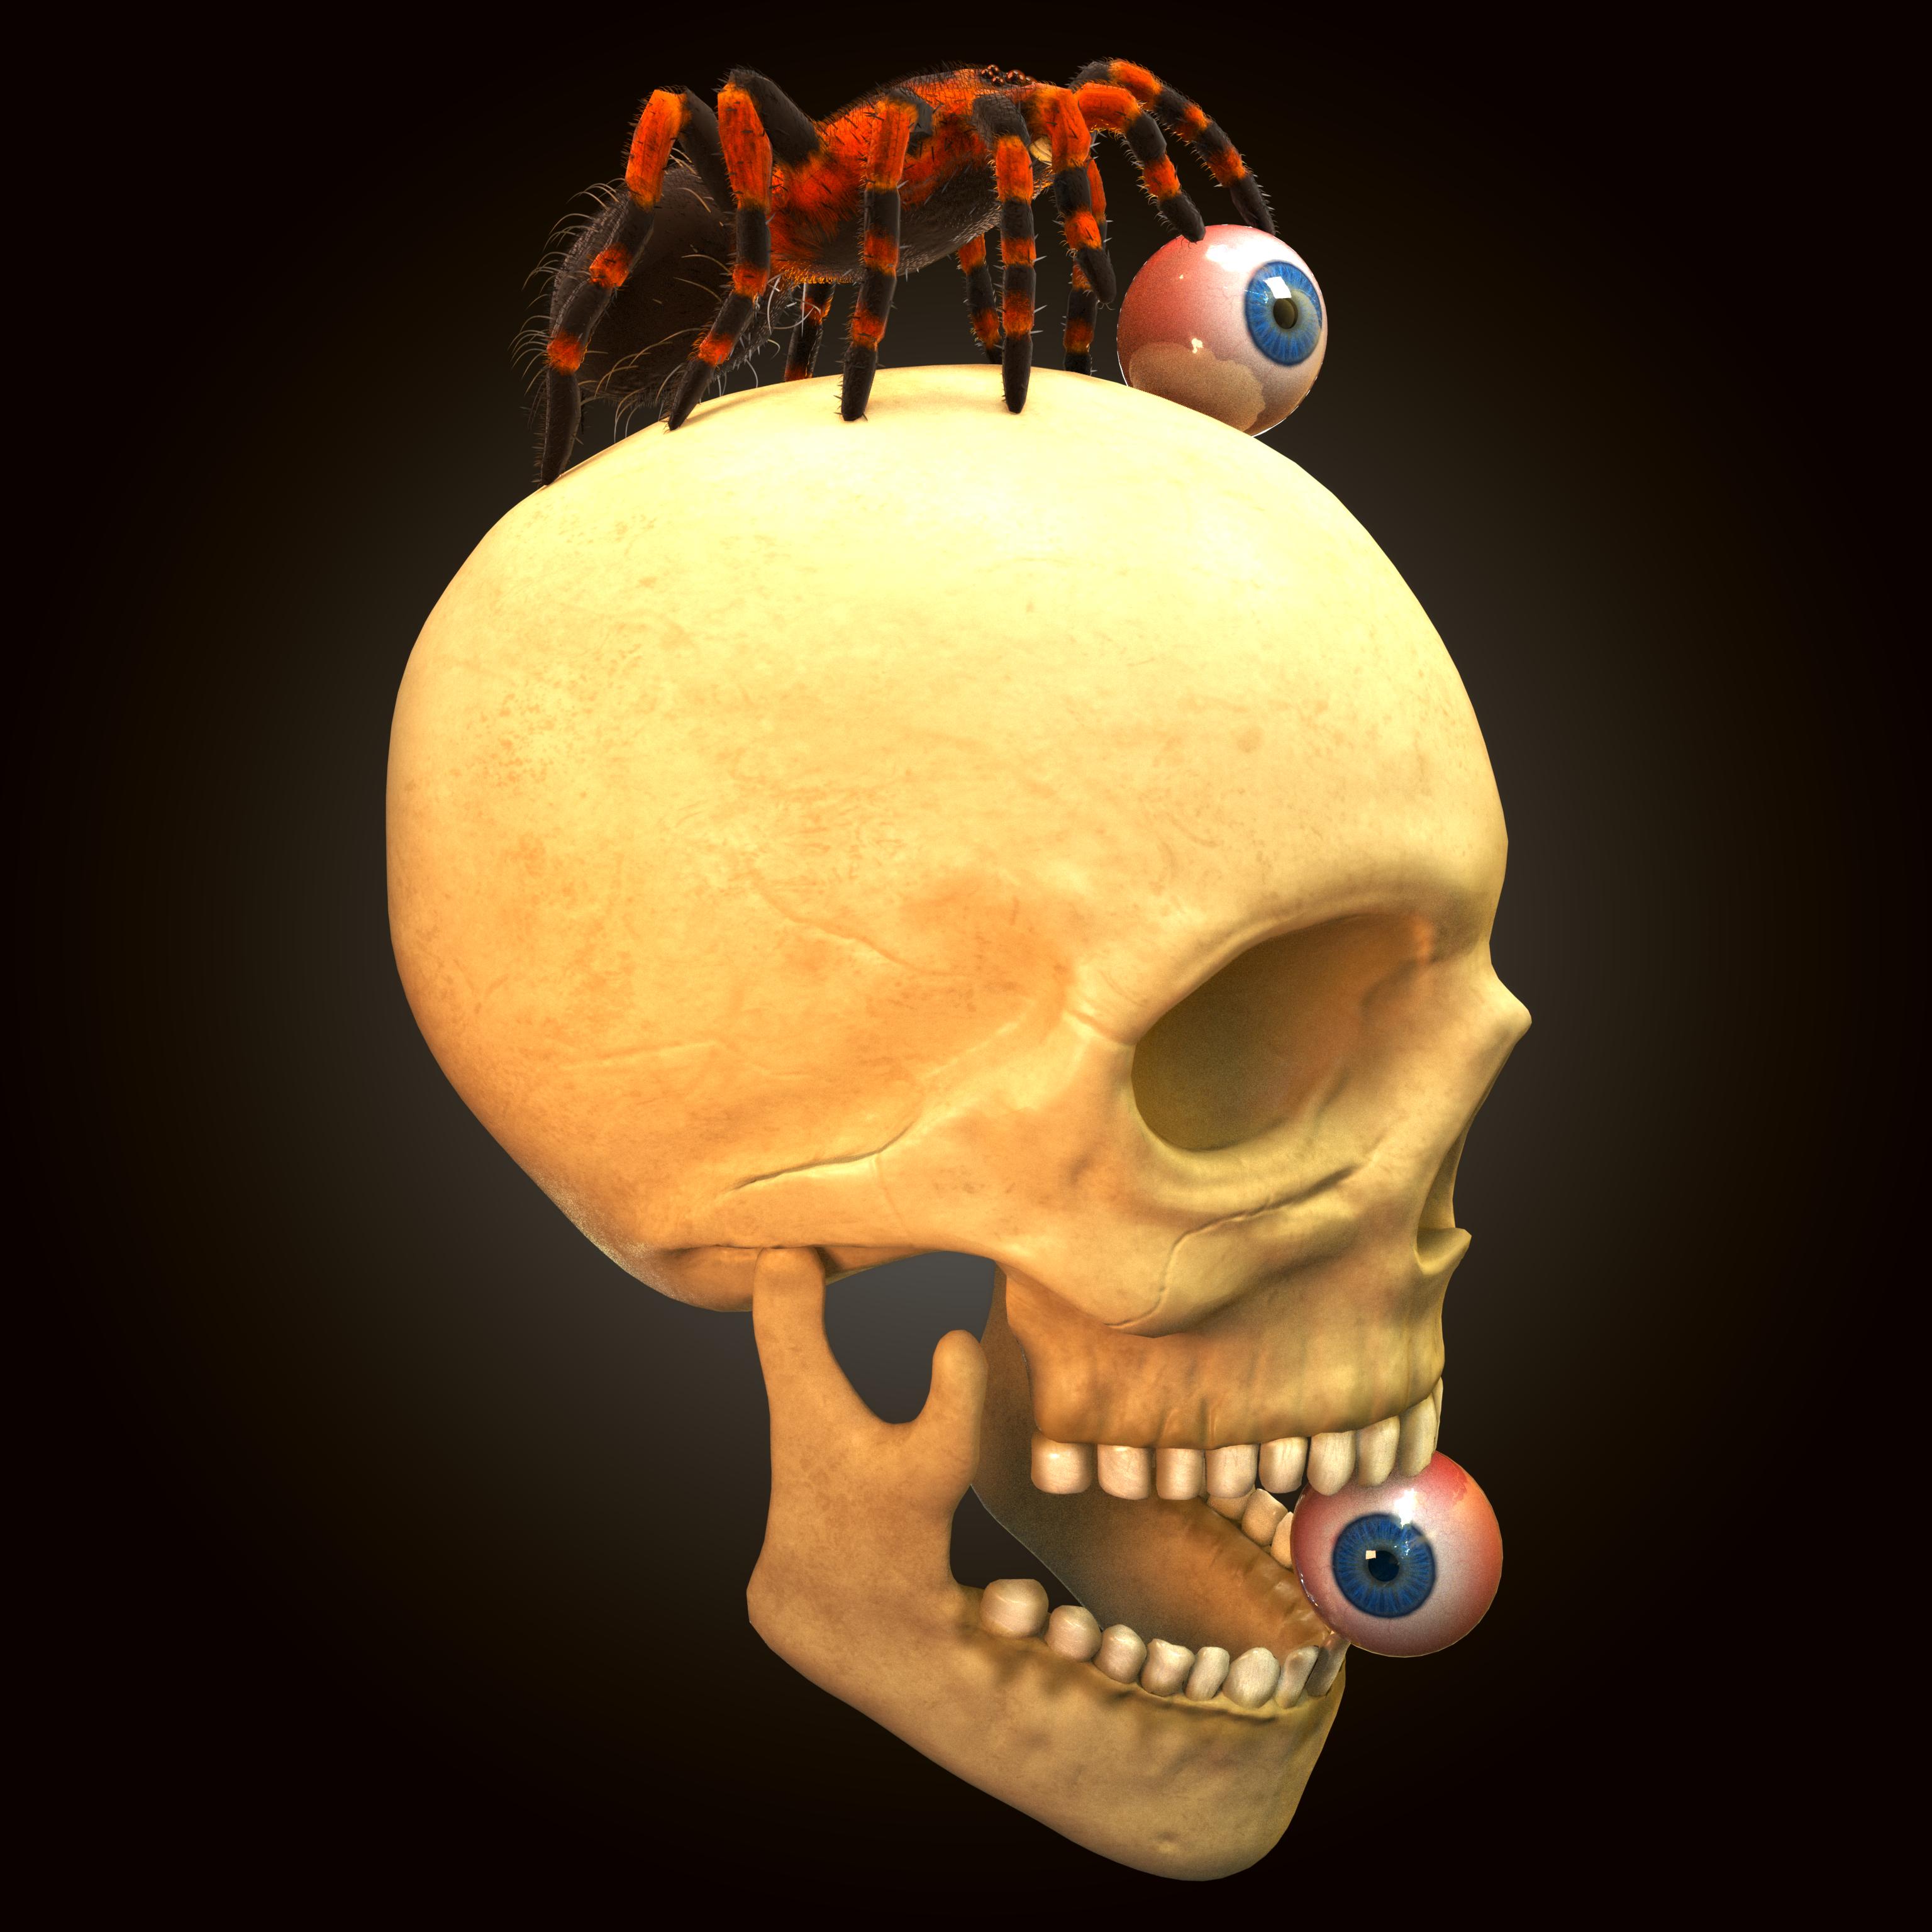 skull_tarantula_eyes__perspShape_beauty.0001.png